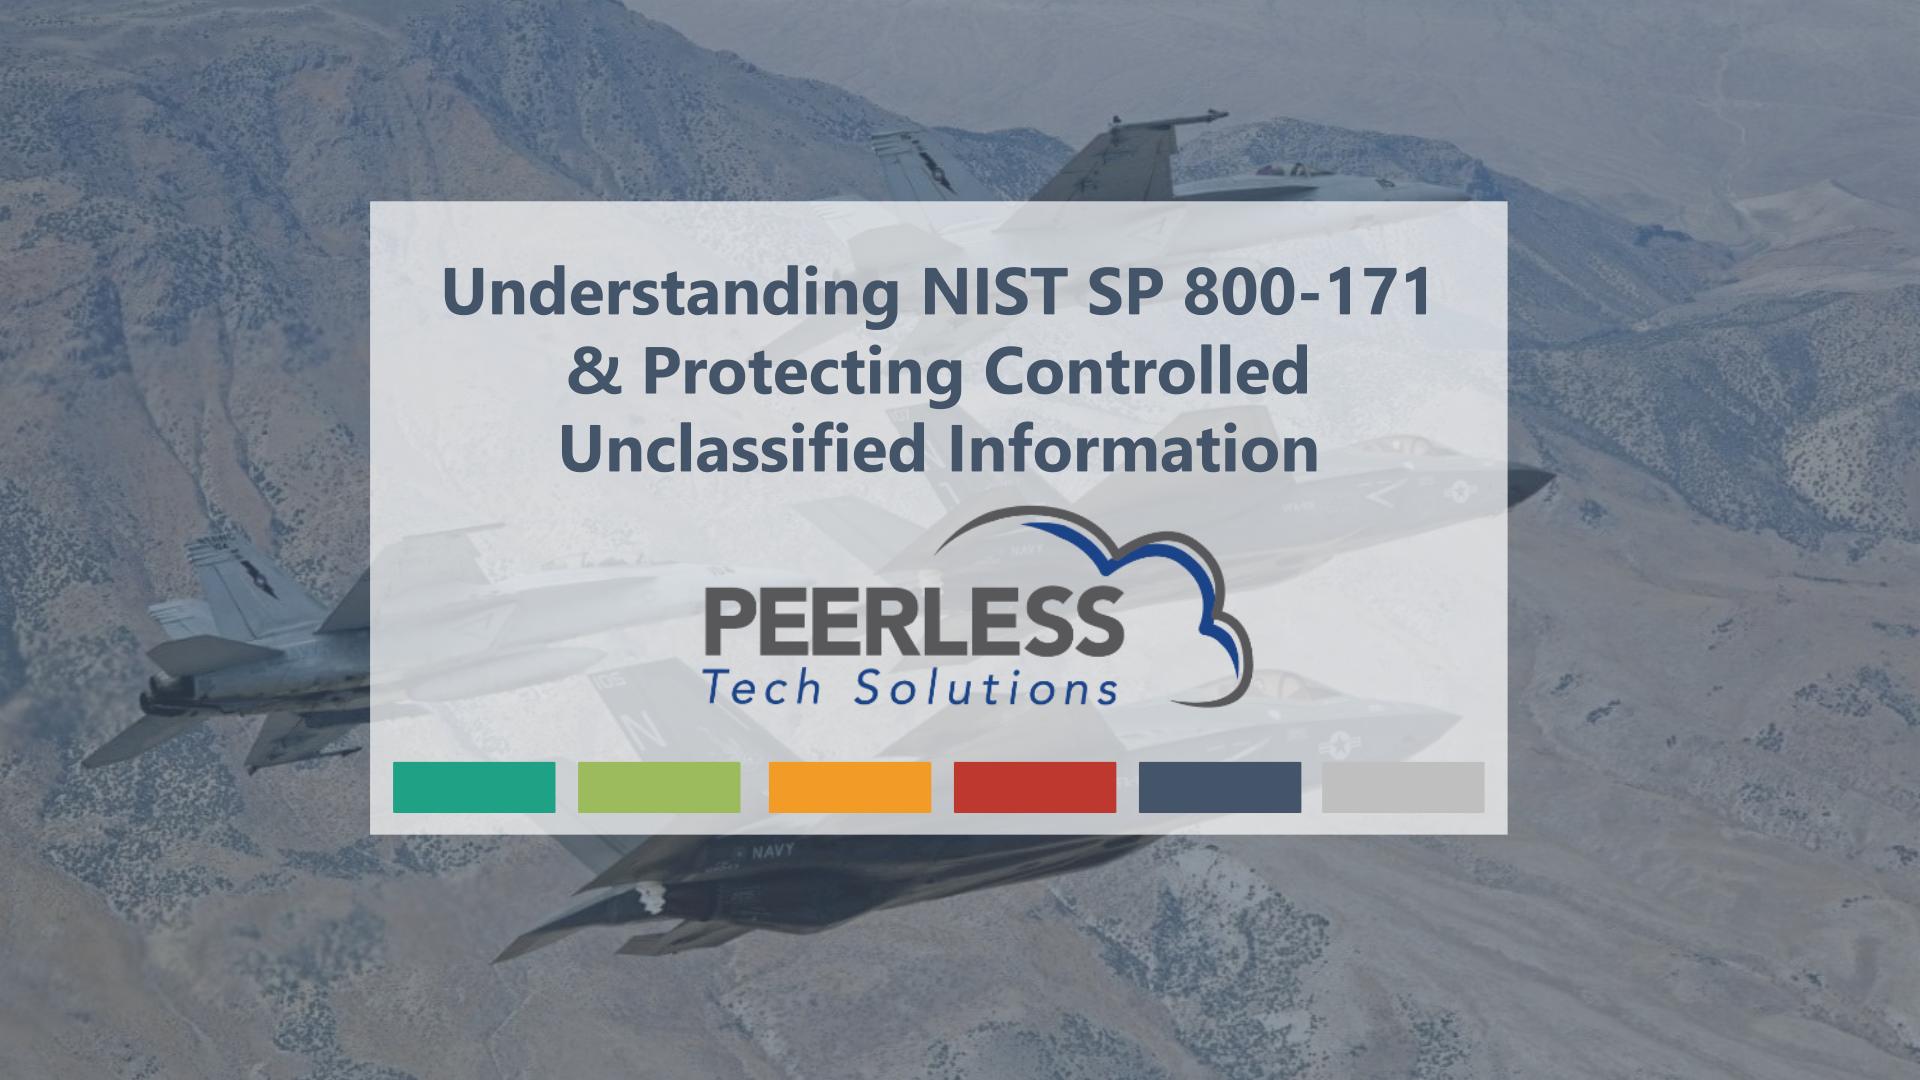 Webinar_Understanding NIST SP 800-171 and Protecting CUI